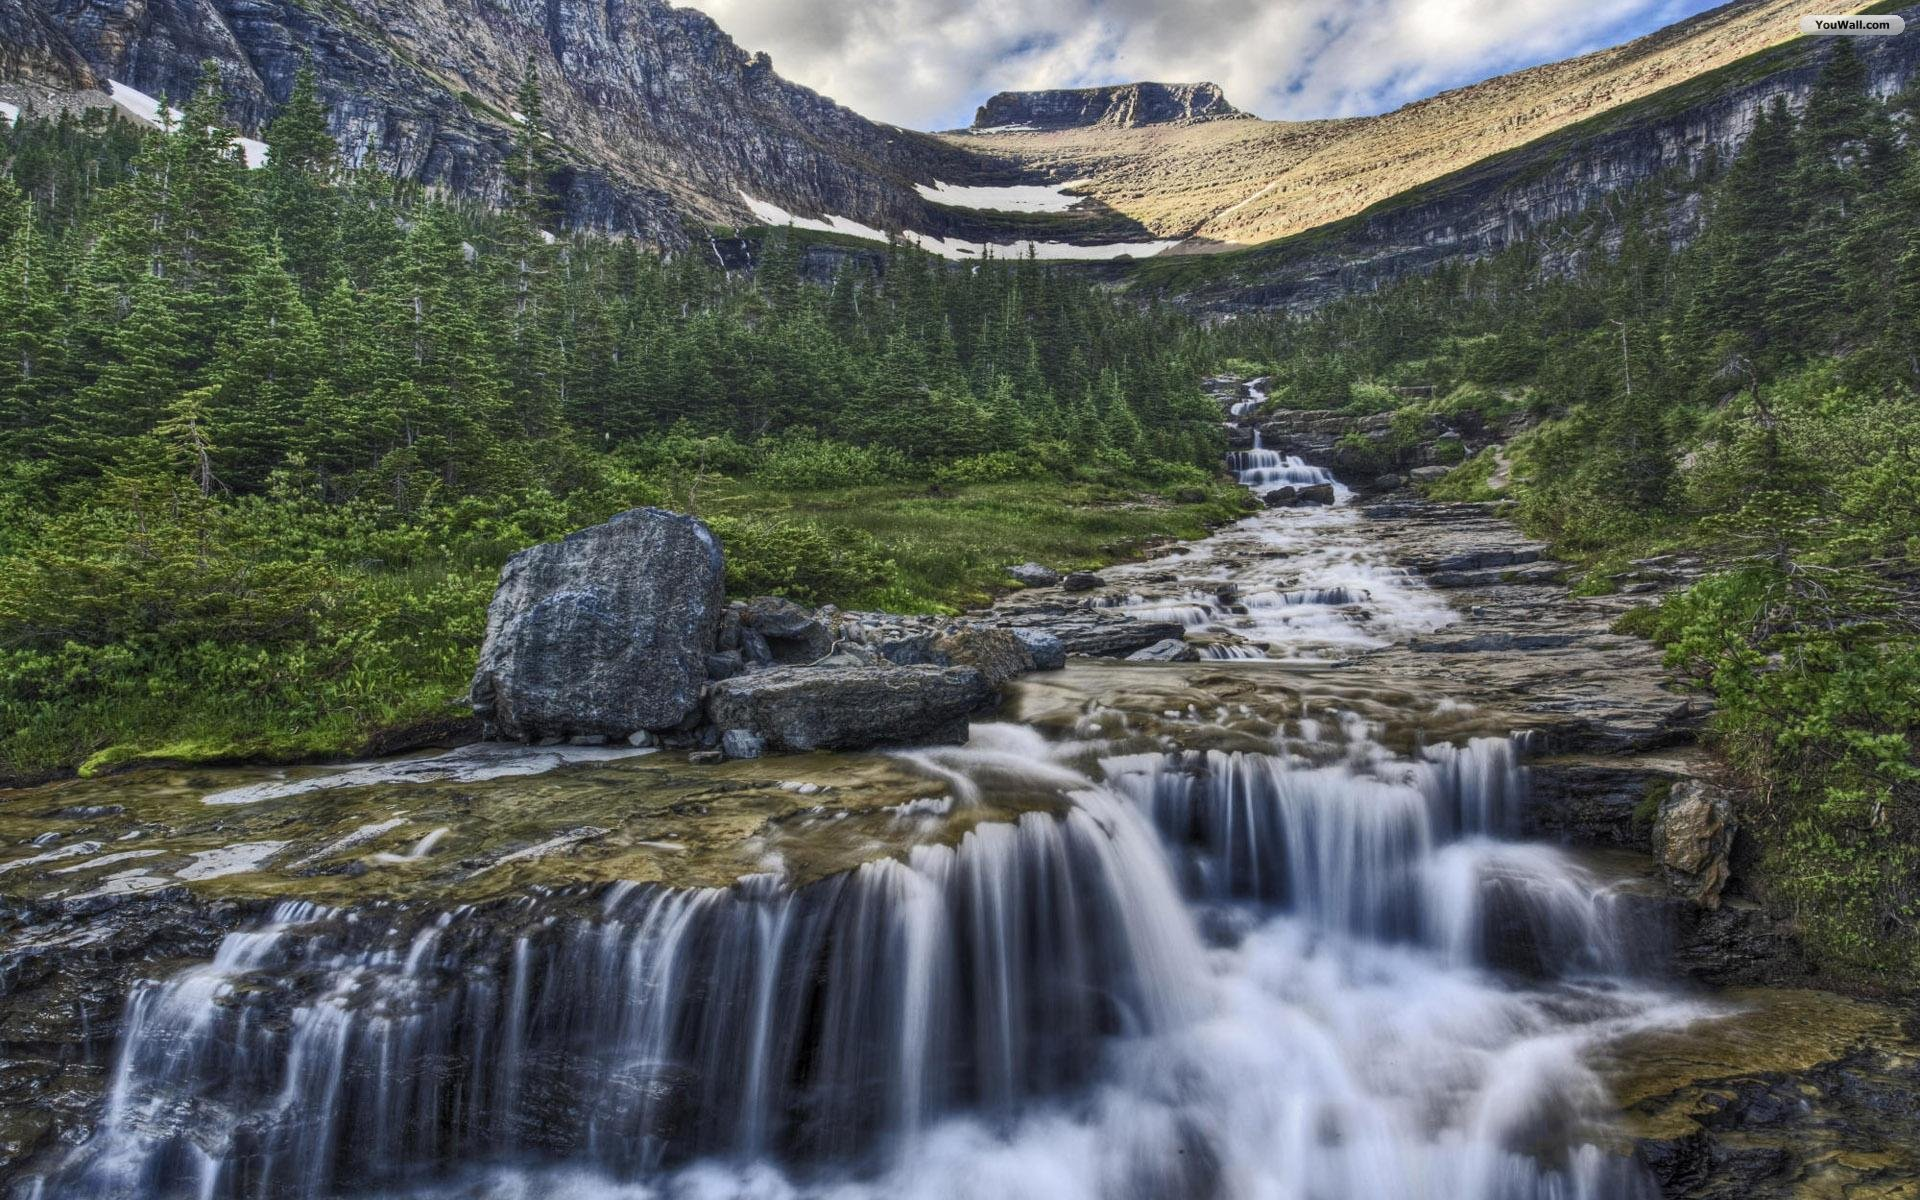 Mountain River Waterfall Wallpaper   wallpaperwallpapersfree 1920x1200